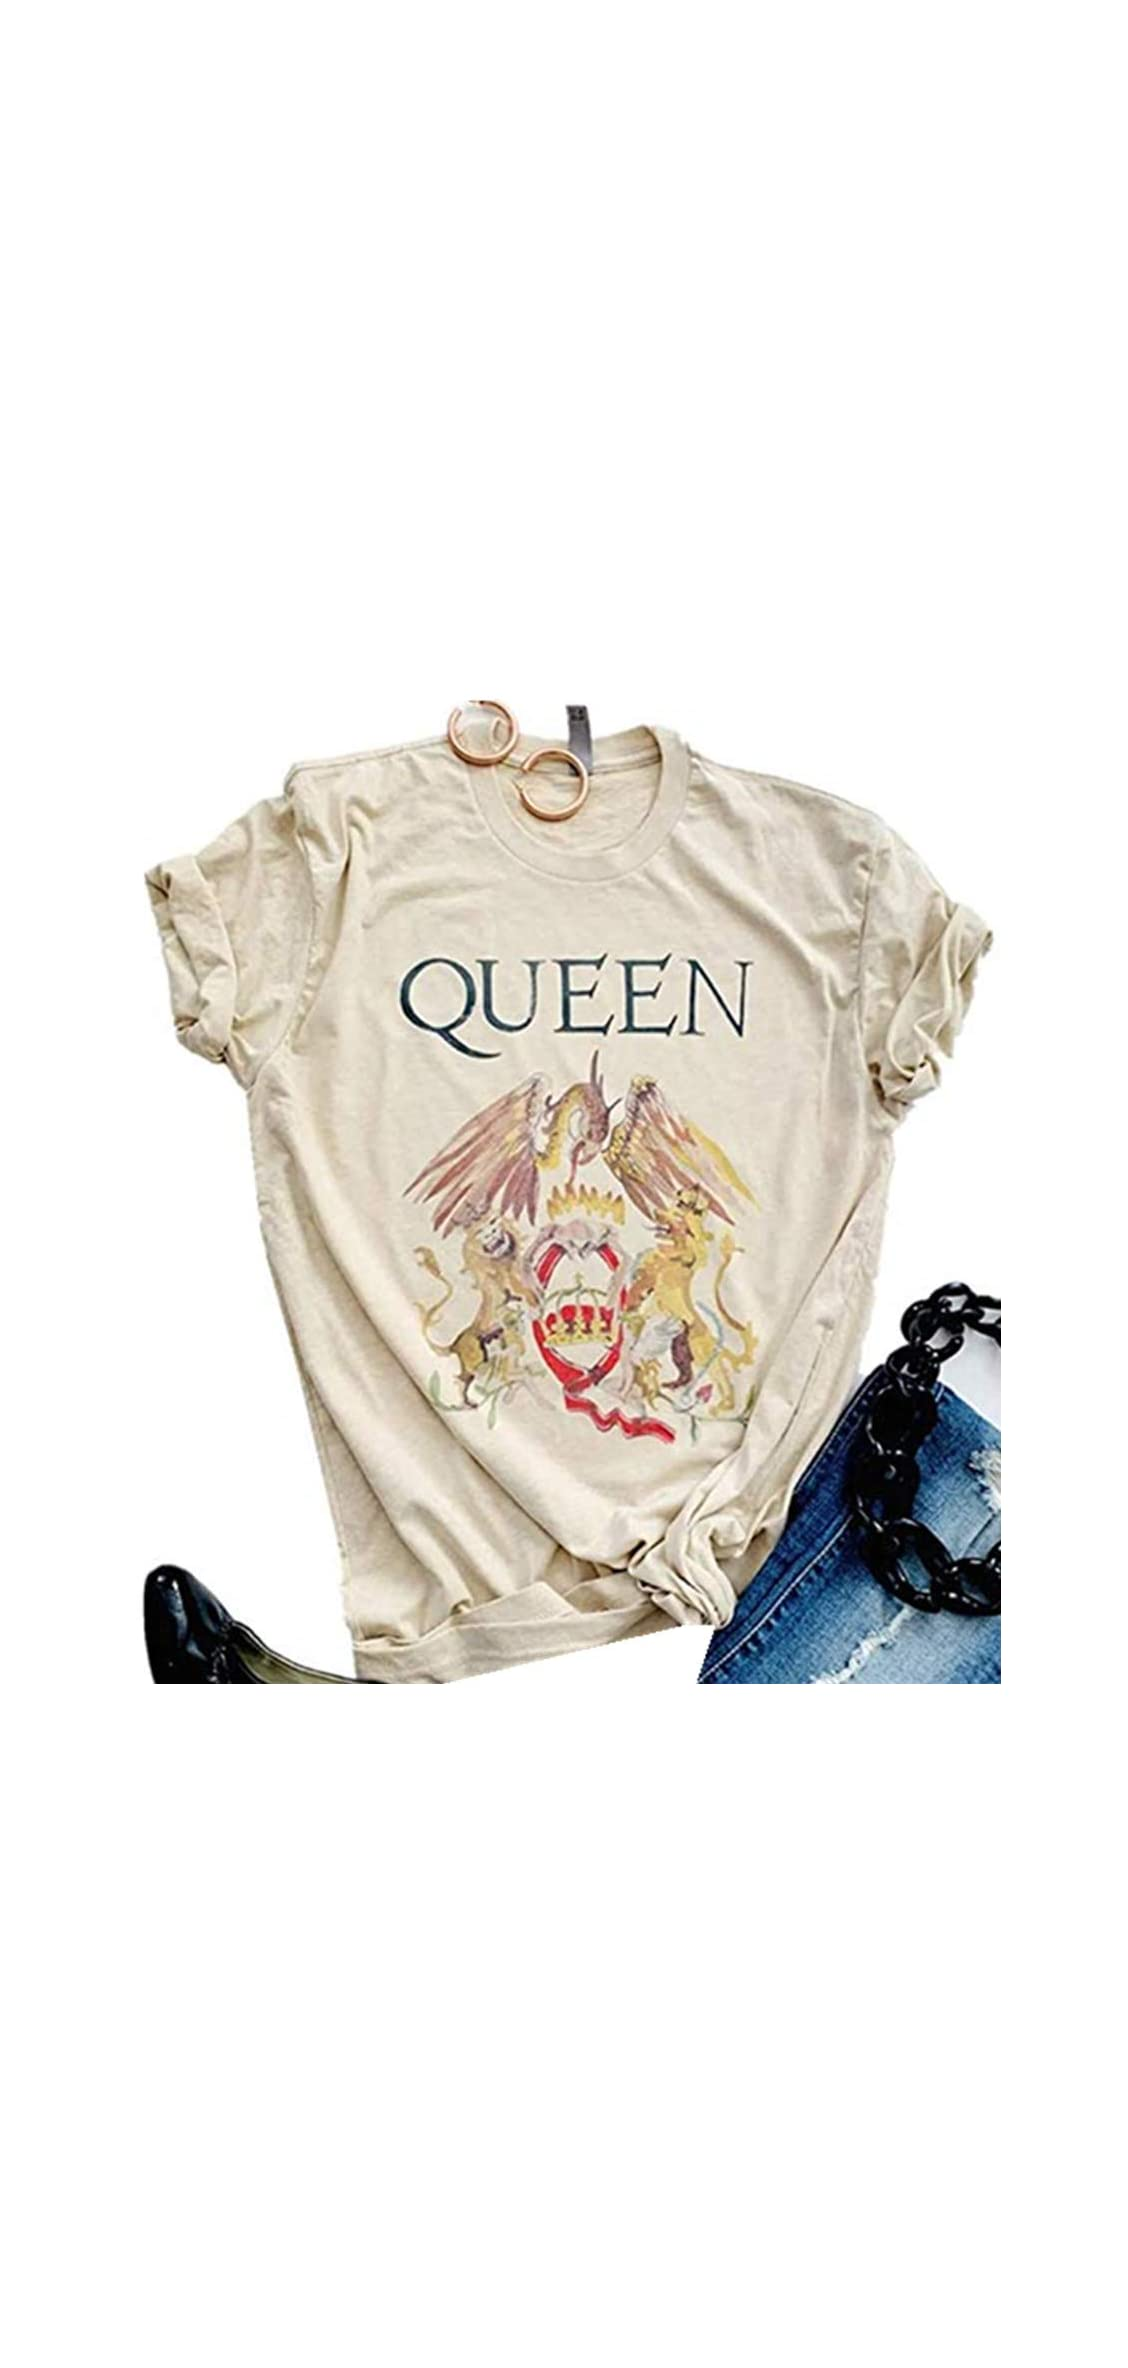 Queen T-shirt Vintage Freddie Memorial Day Graphic Tees Cute